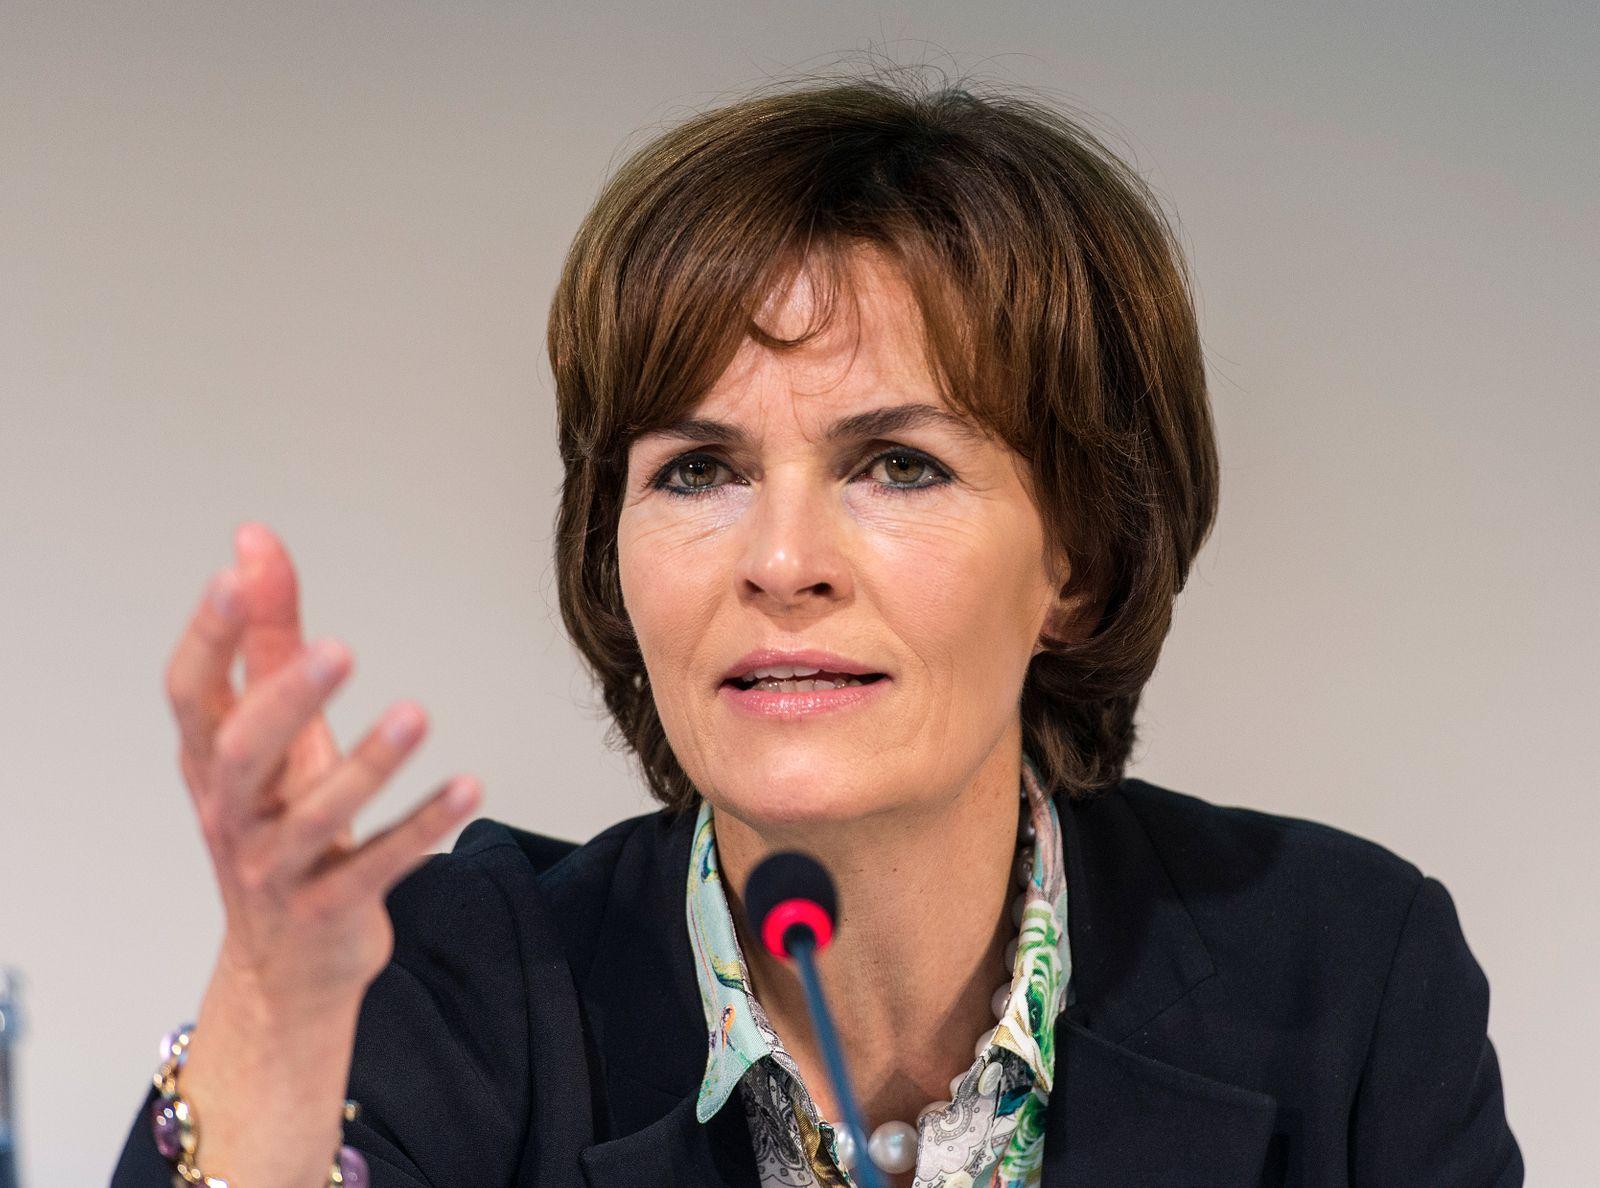 Nicola Leibinger-Kammüller